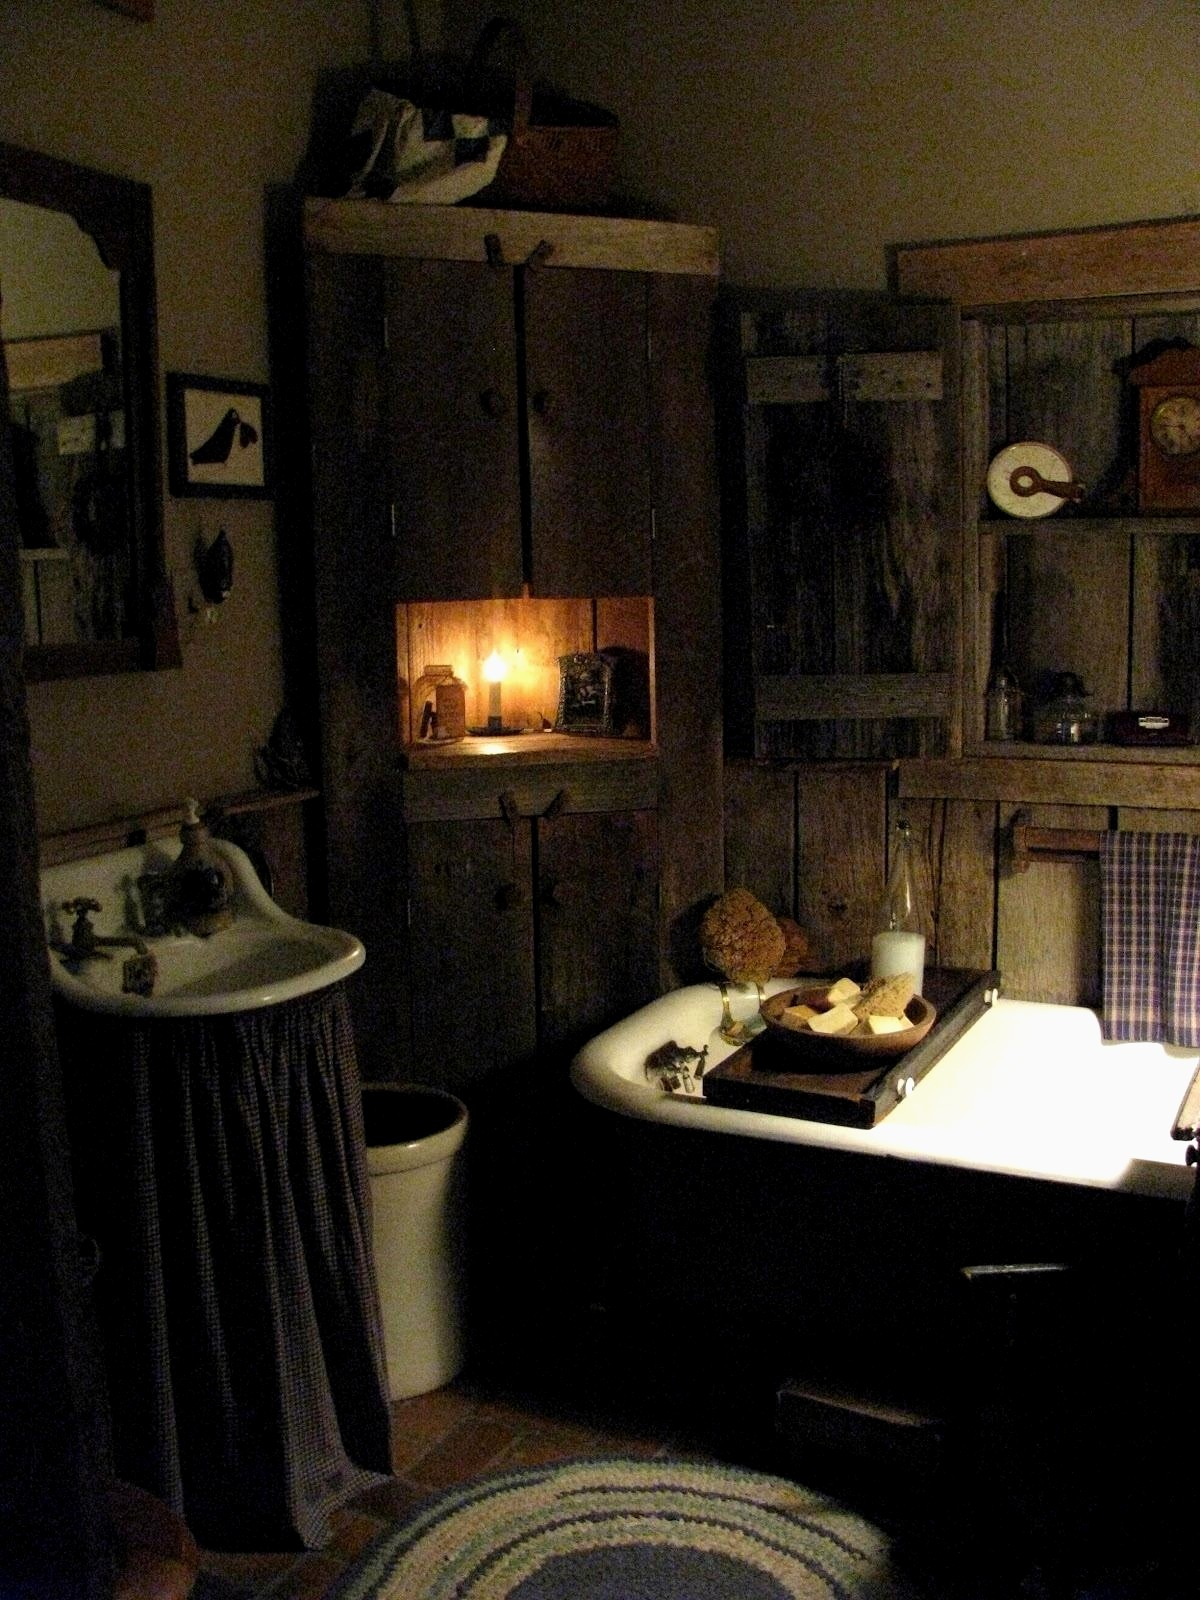 stylish primitive bathroom decor pattern bathroom design ideas rh bridgeportbenedumfestival com Primitive Bathroom Decor Country Crafts Catalogs